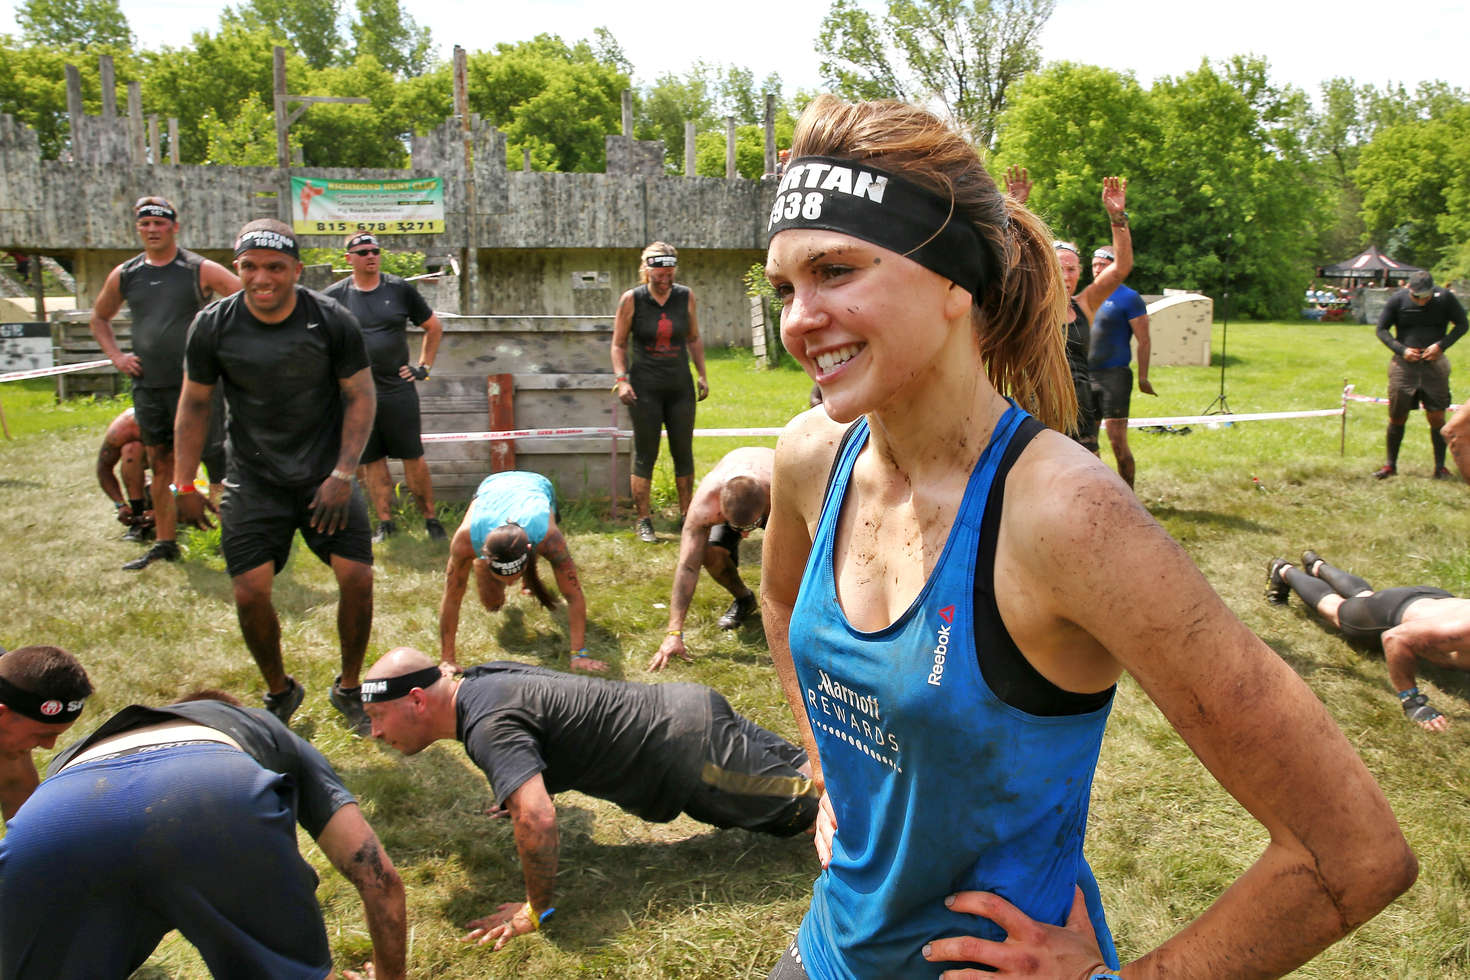 Aimee Teegarden 2016 : Aimee Teegarden: Competing in the Spartan Super Race -10